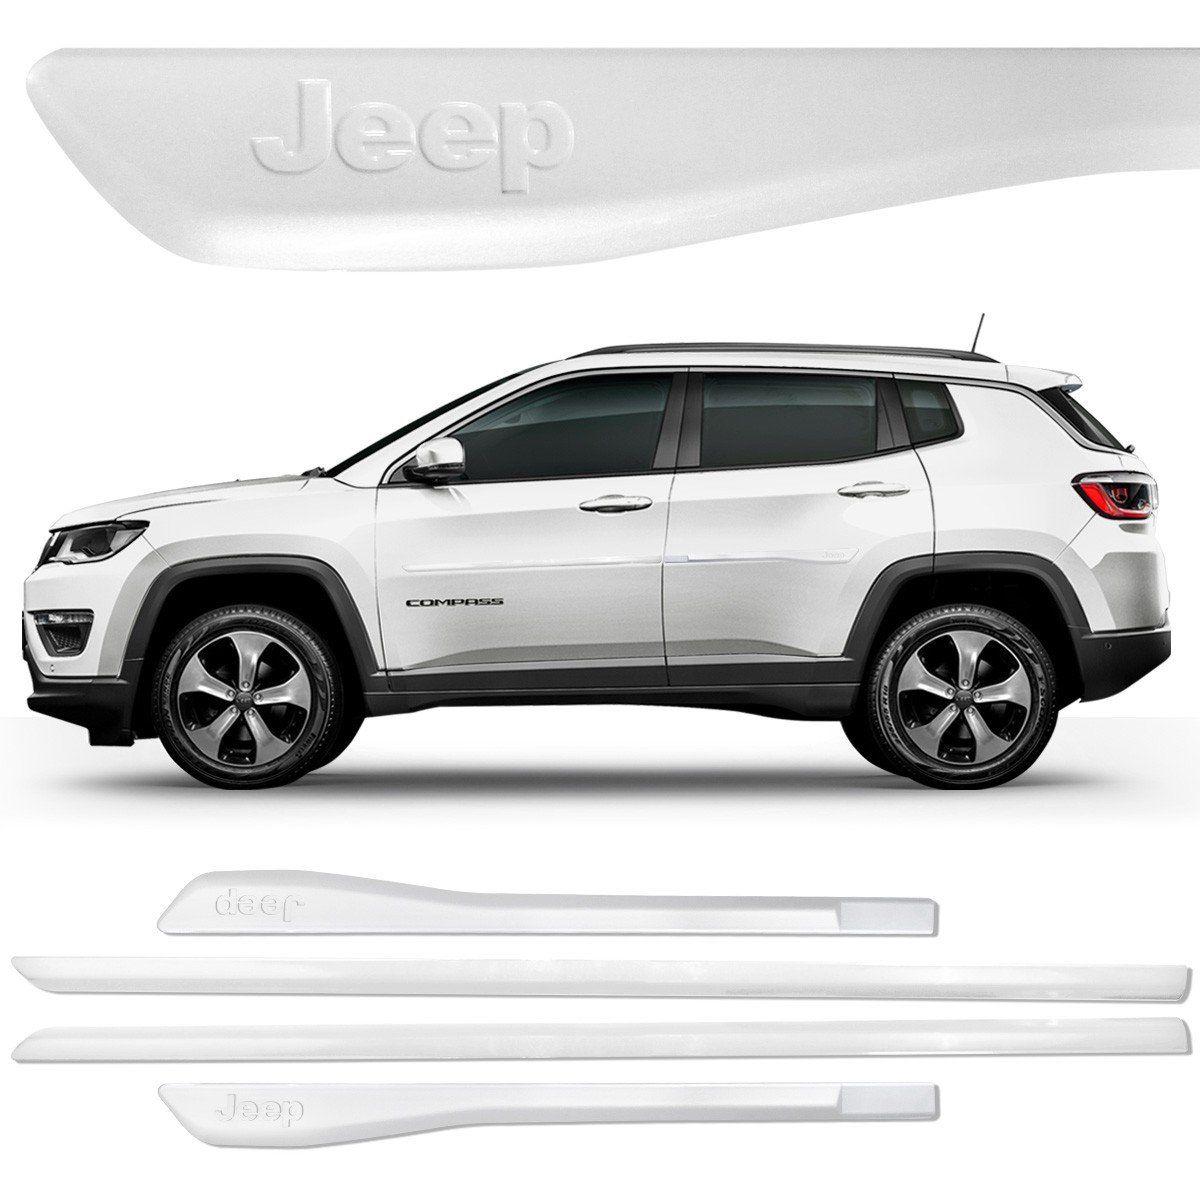 Jogo Friso Lateral Pintado Compass Logo Jeep Branco Ambiente